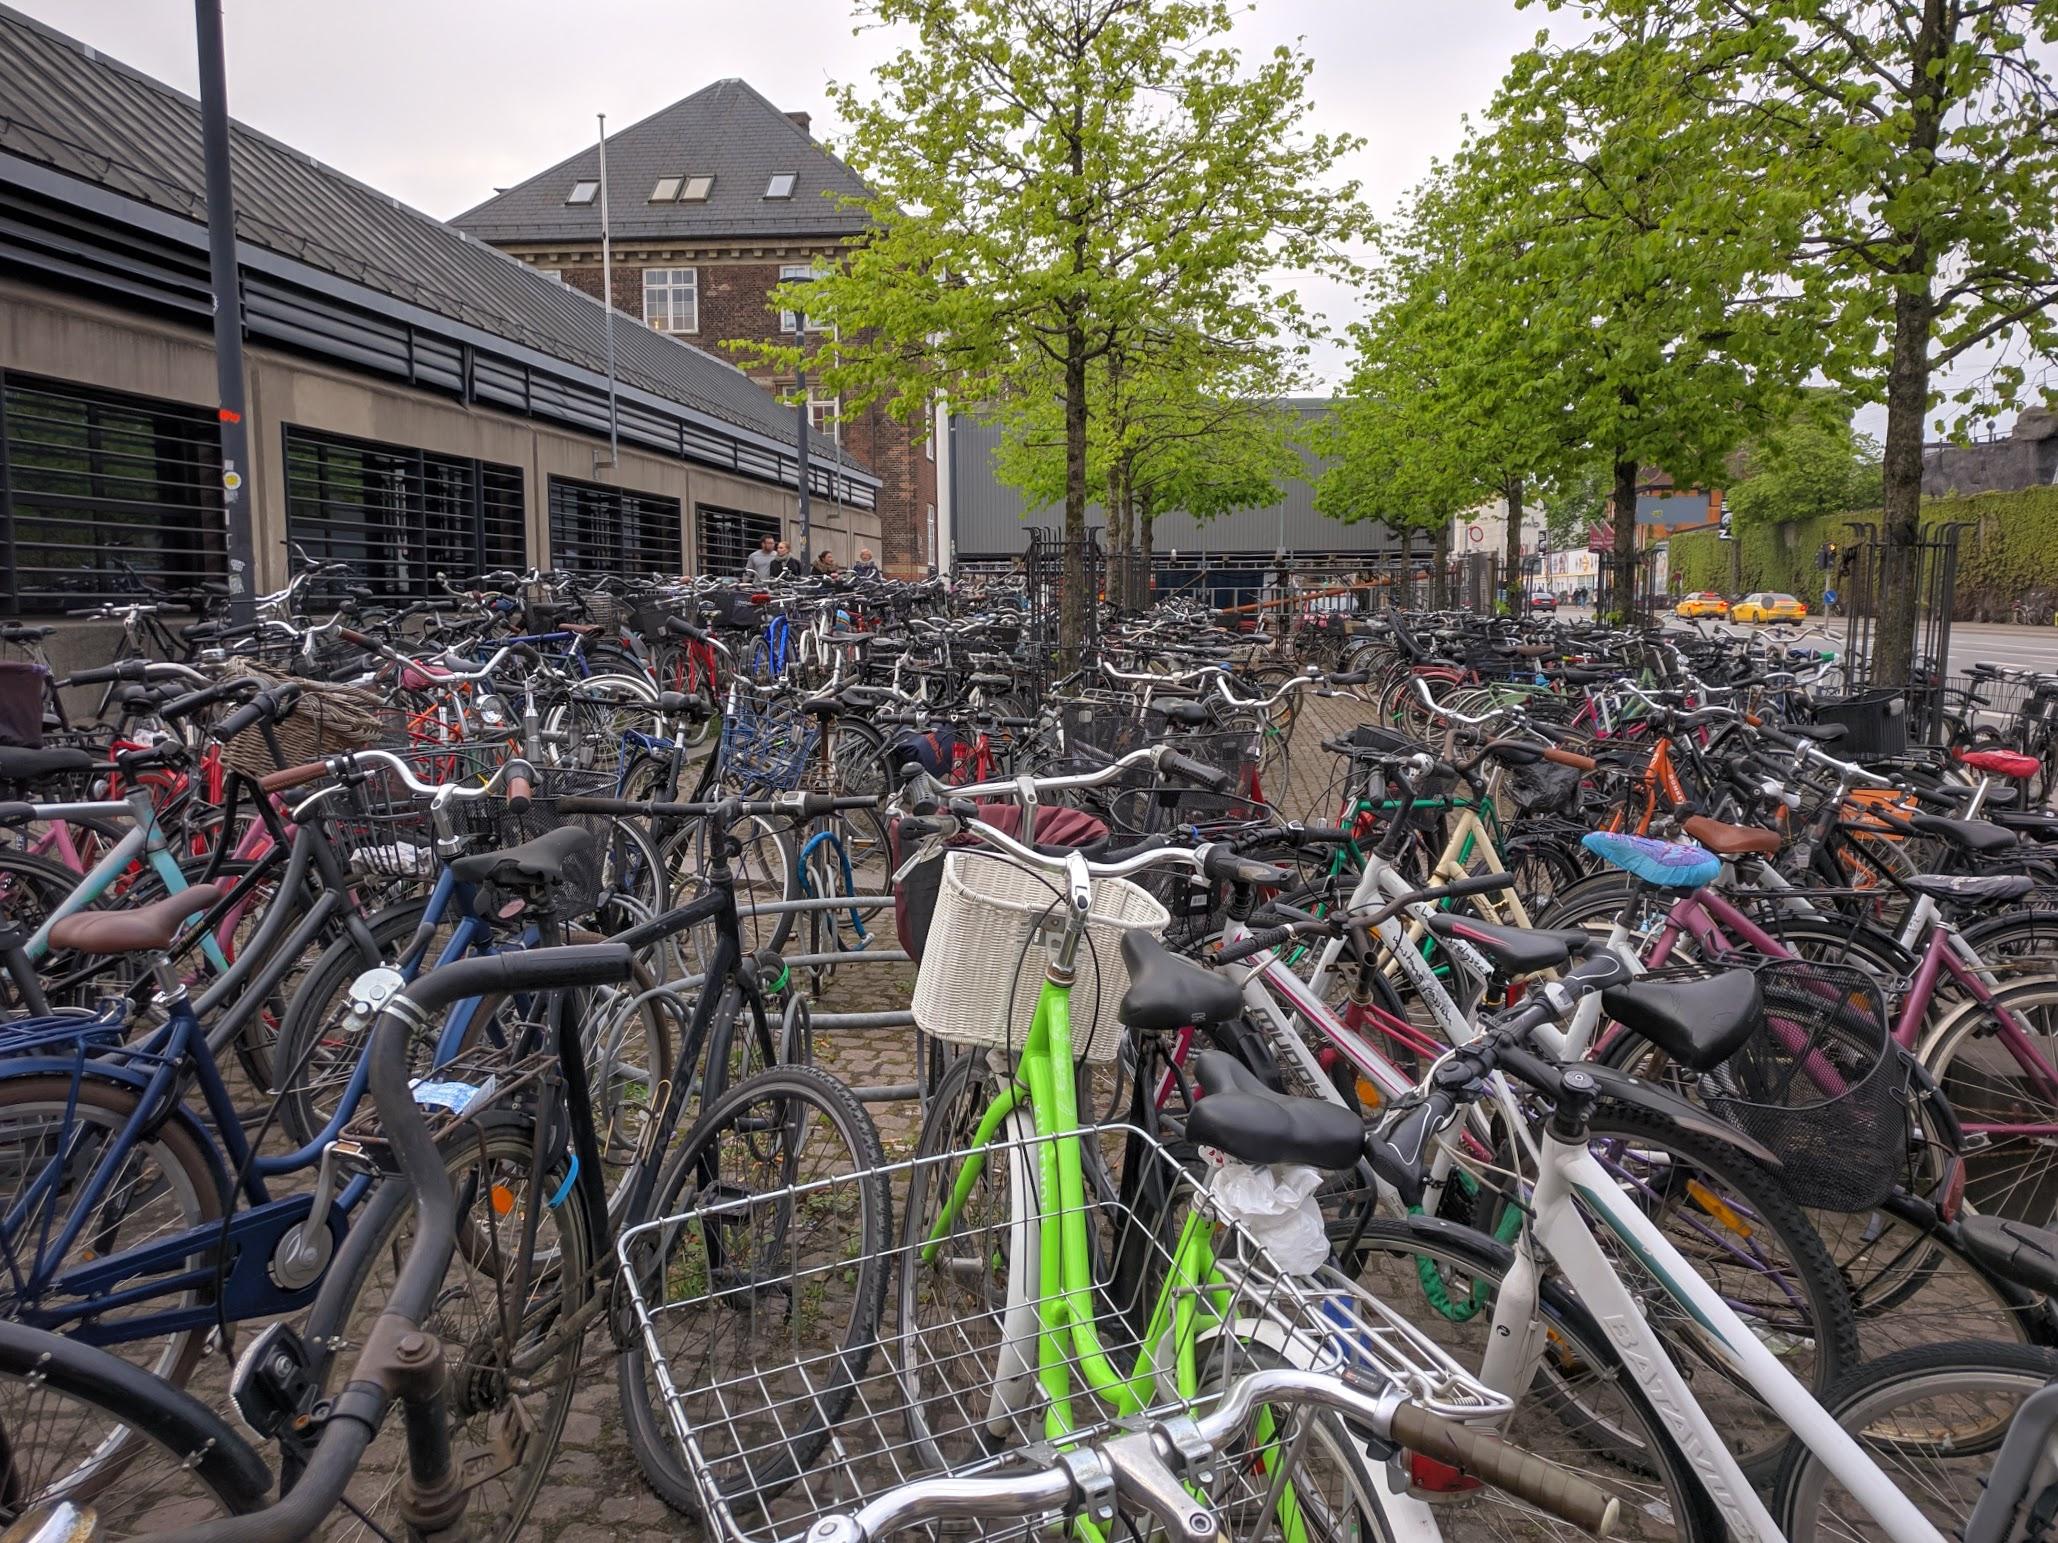 https://madrid.mattrossman.com/img/04/29/bikes.jpg not found